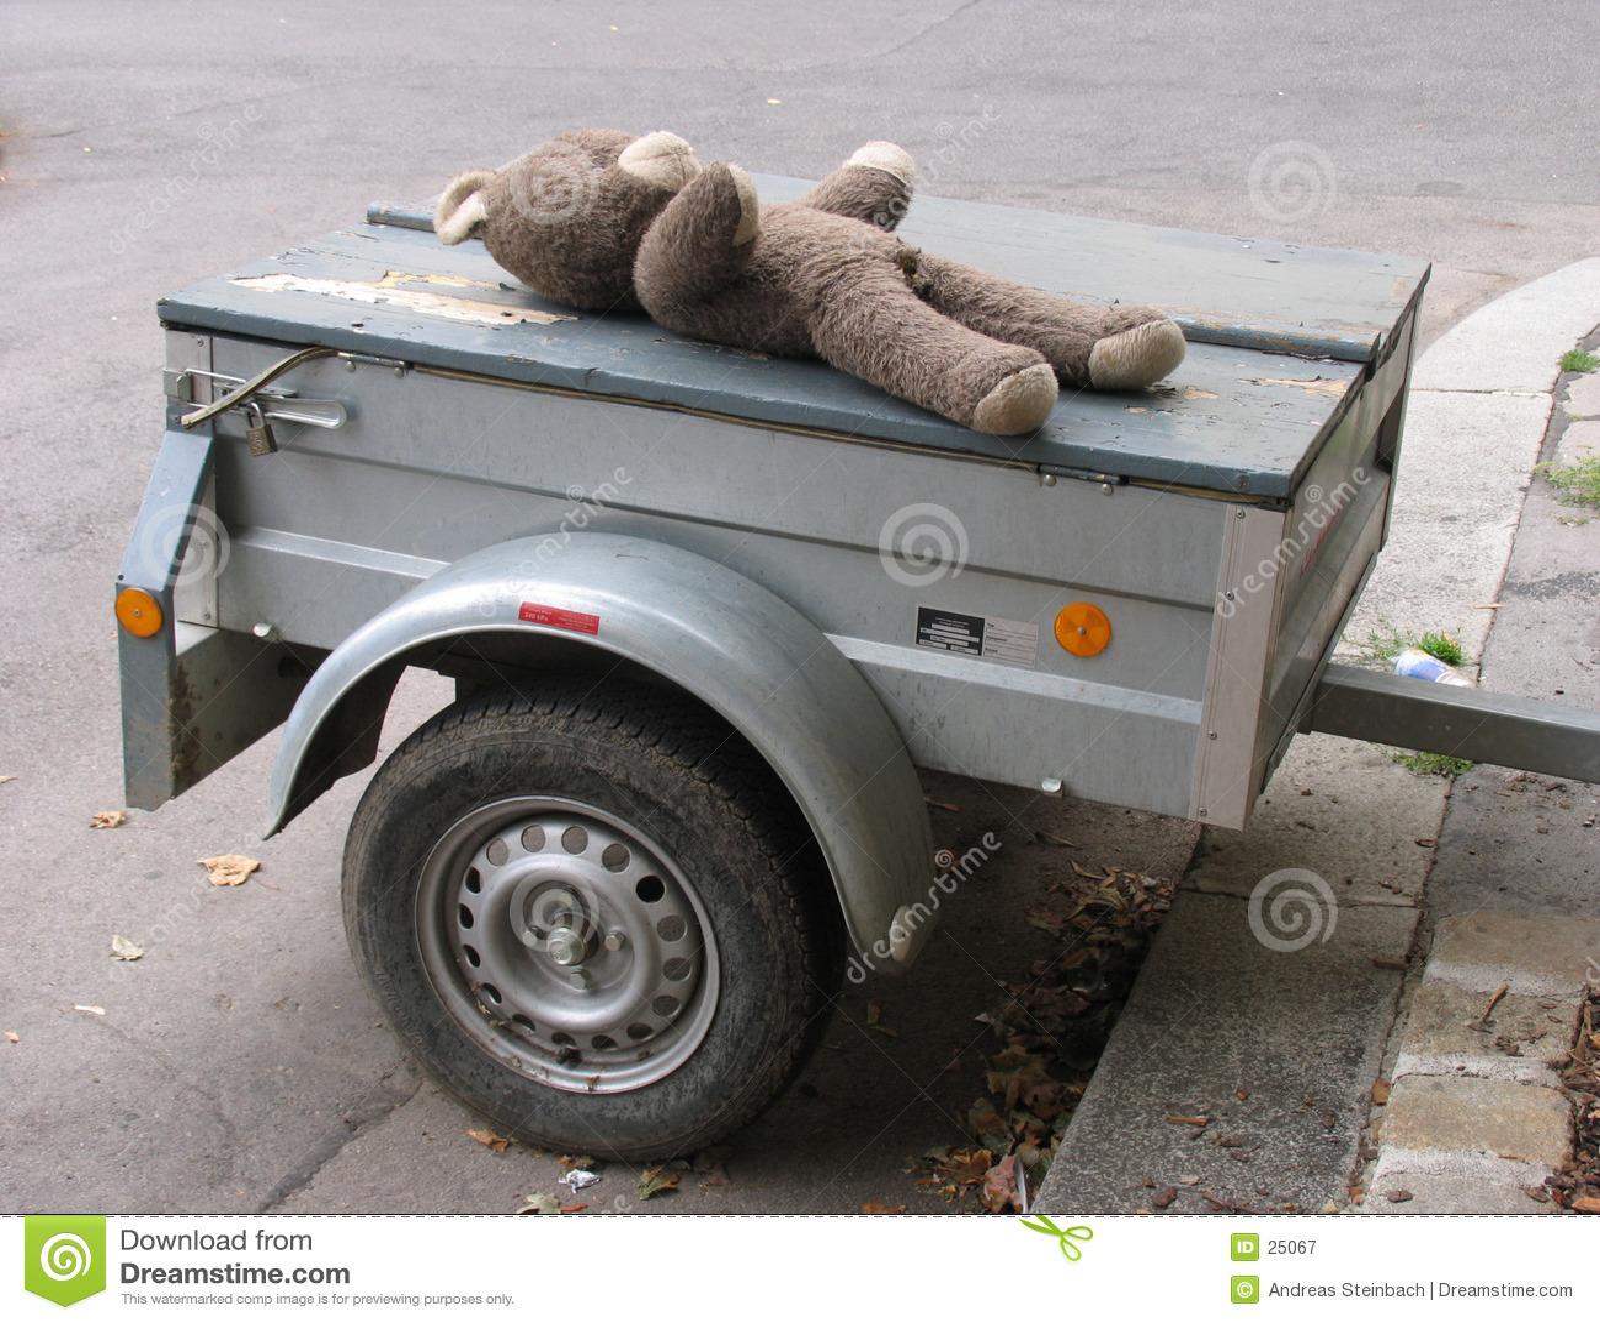 Old teddy on trailer